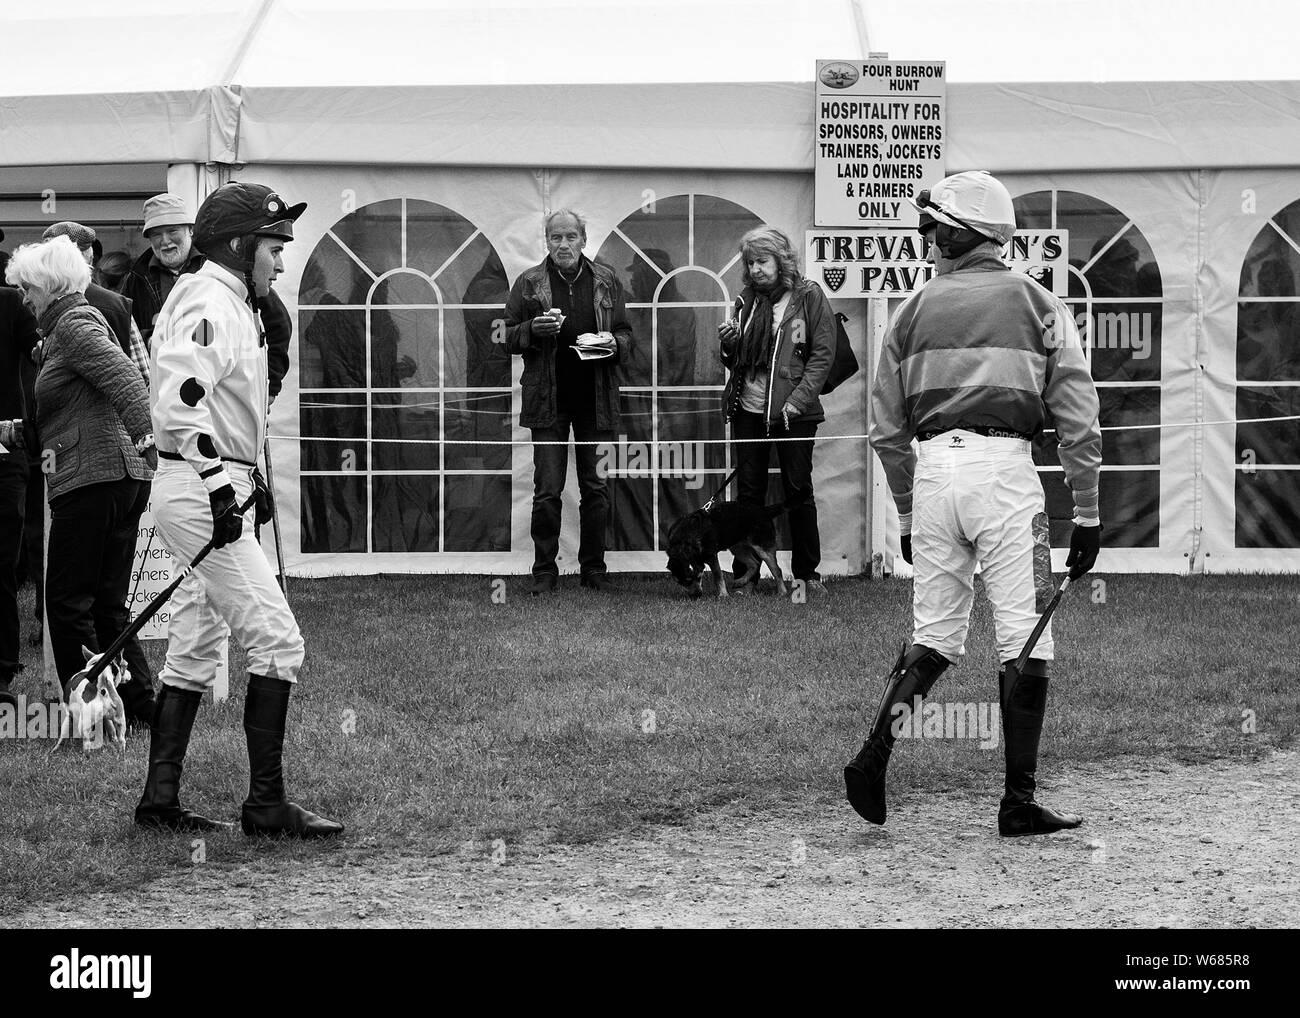 jockeys at the four burrow hunt point to point horse race 2019 Stock Photo